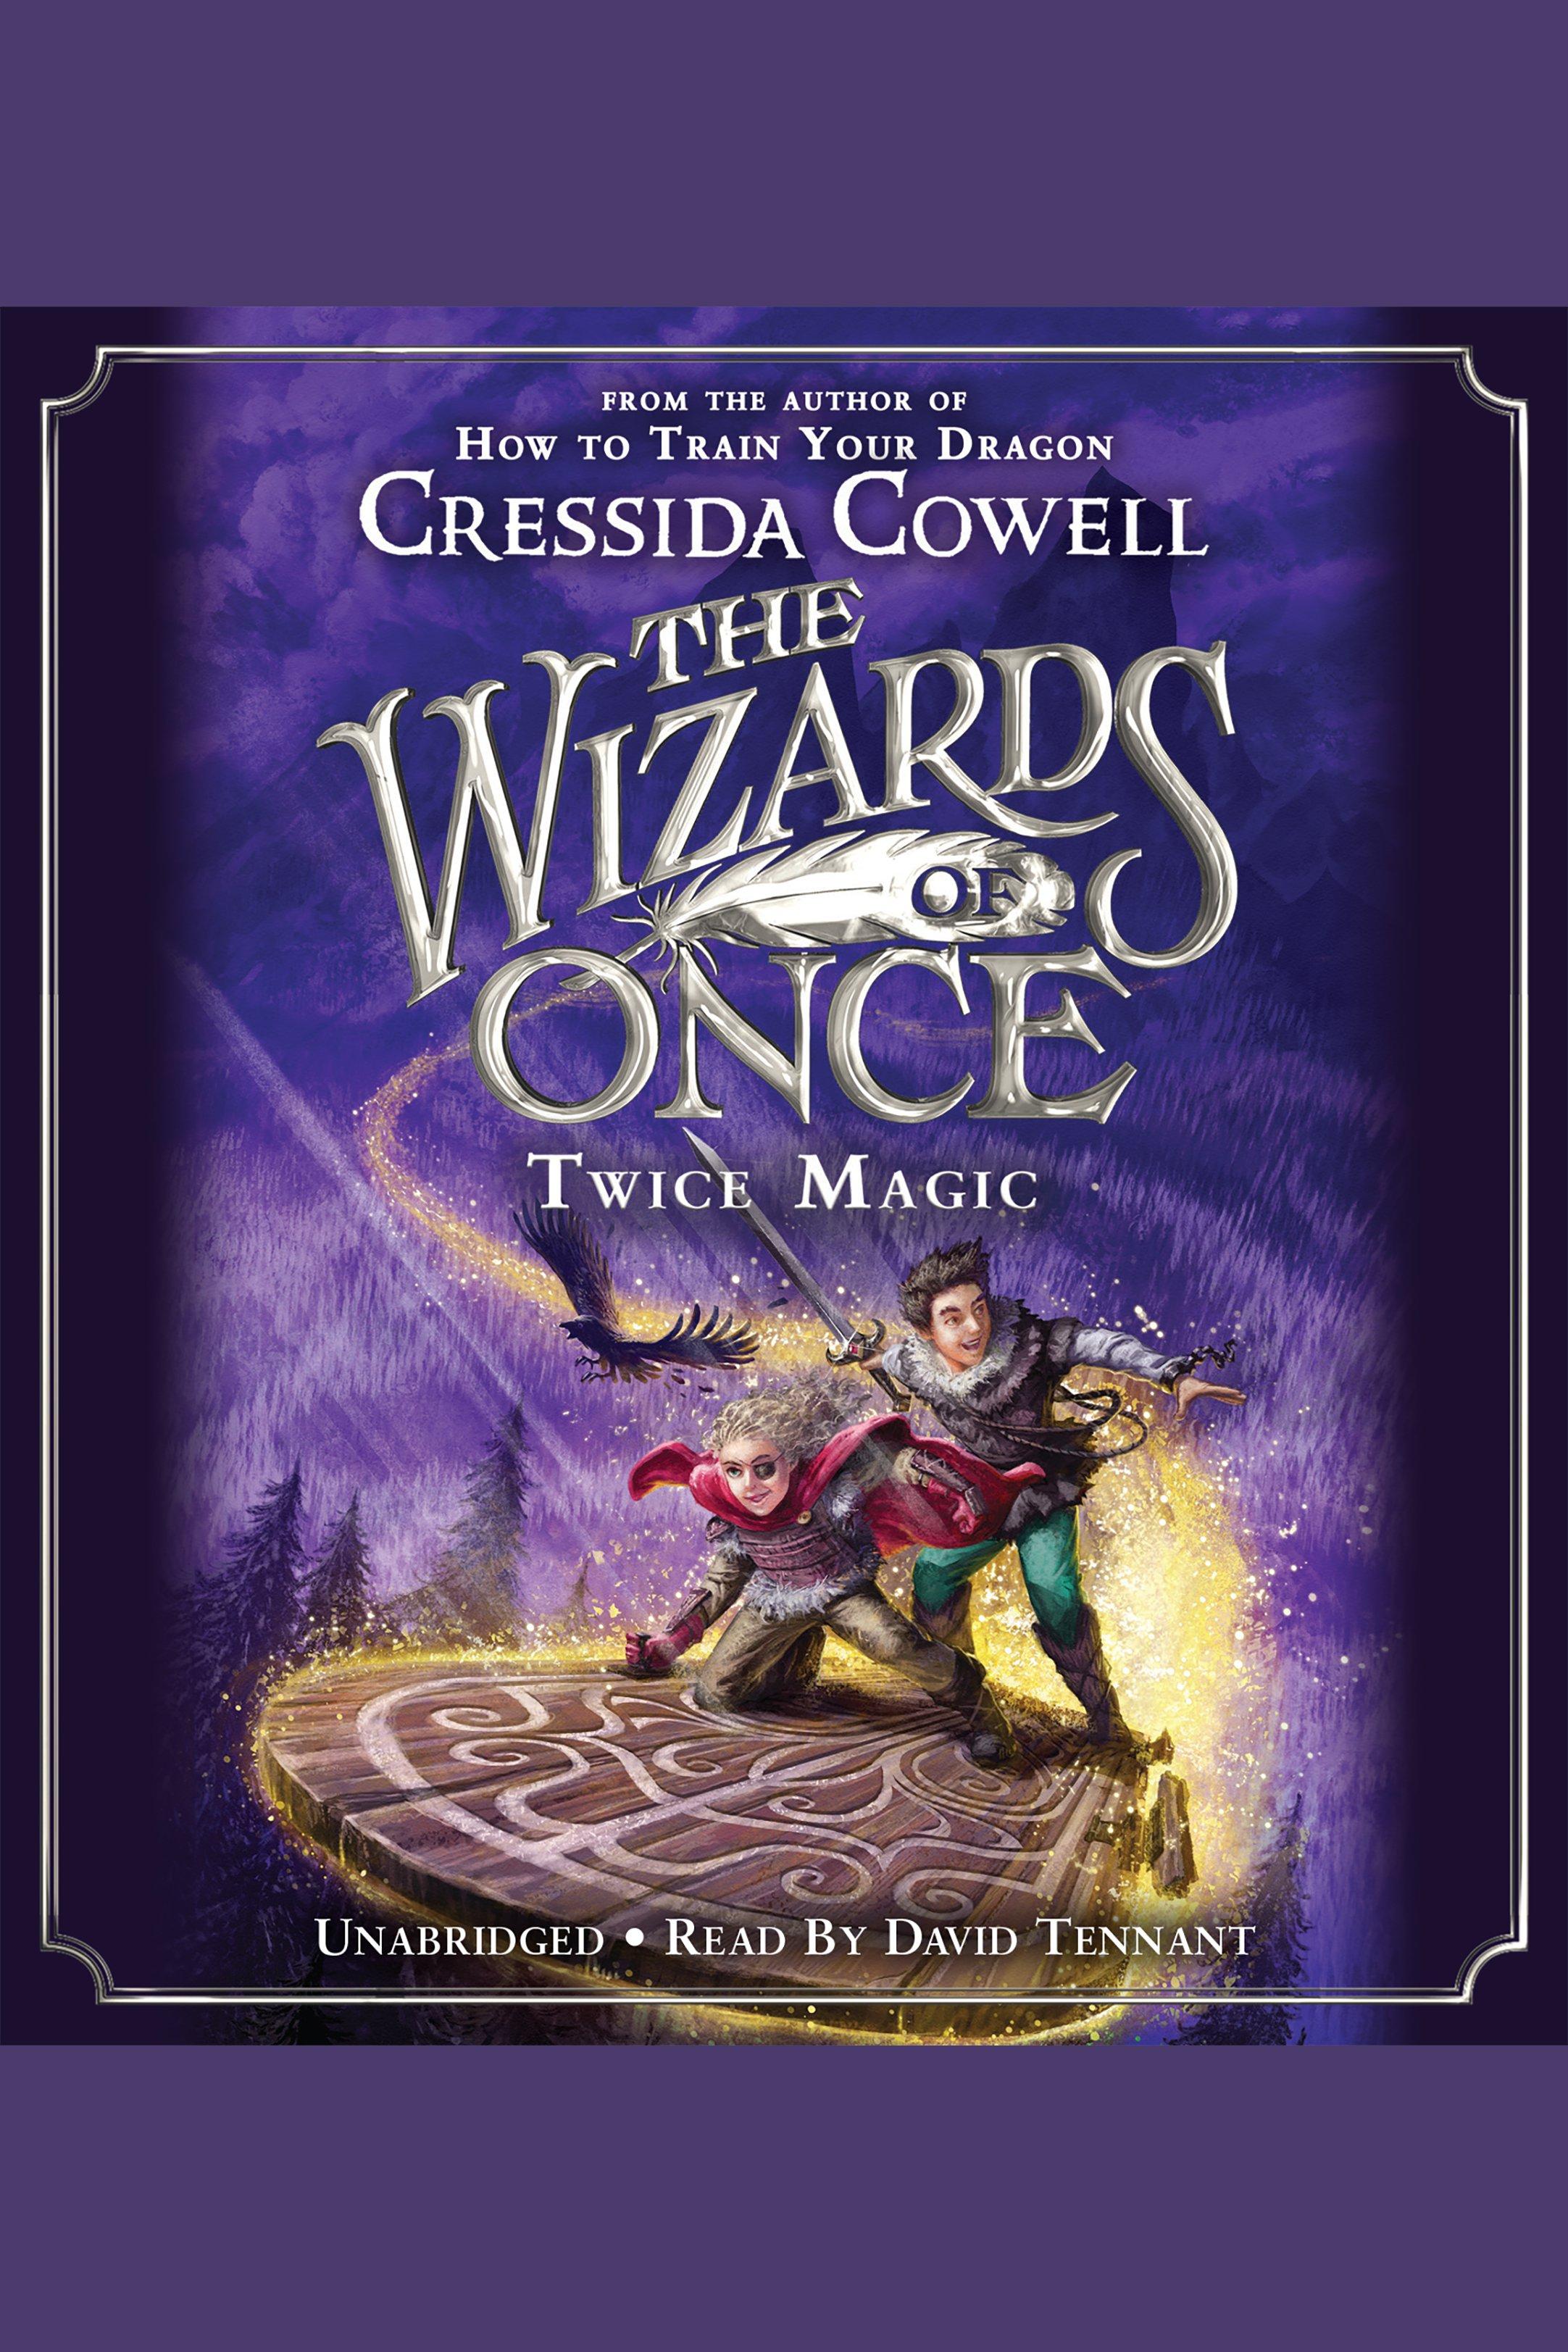 Twice magic cover image